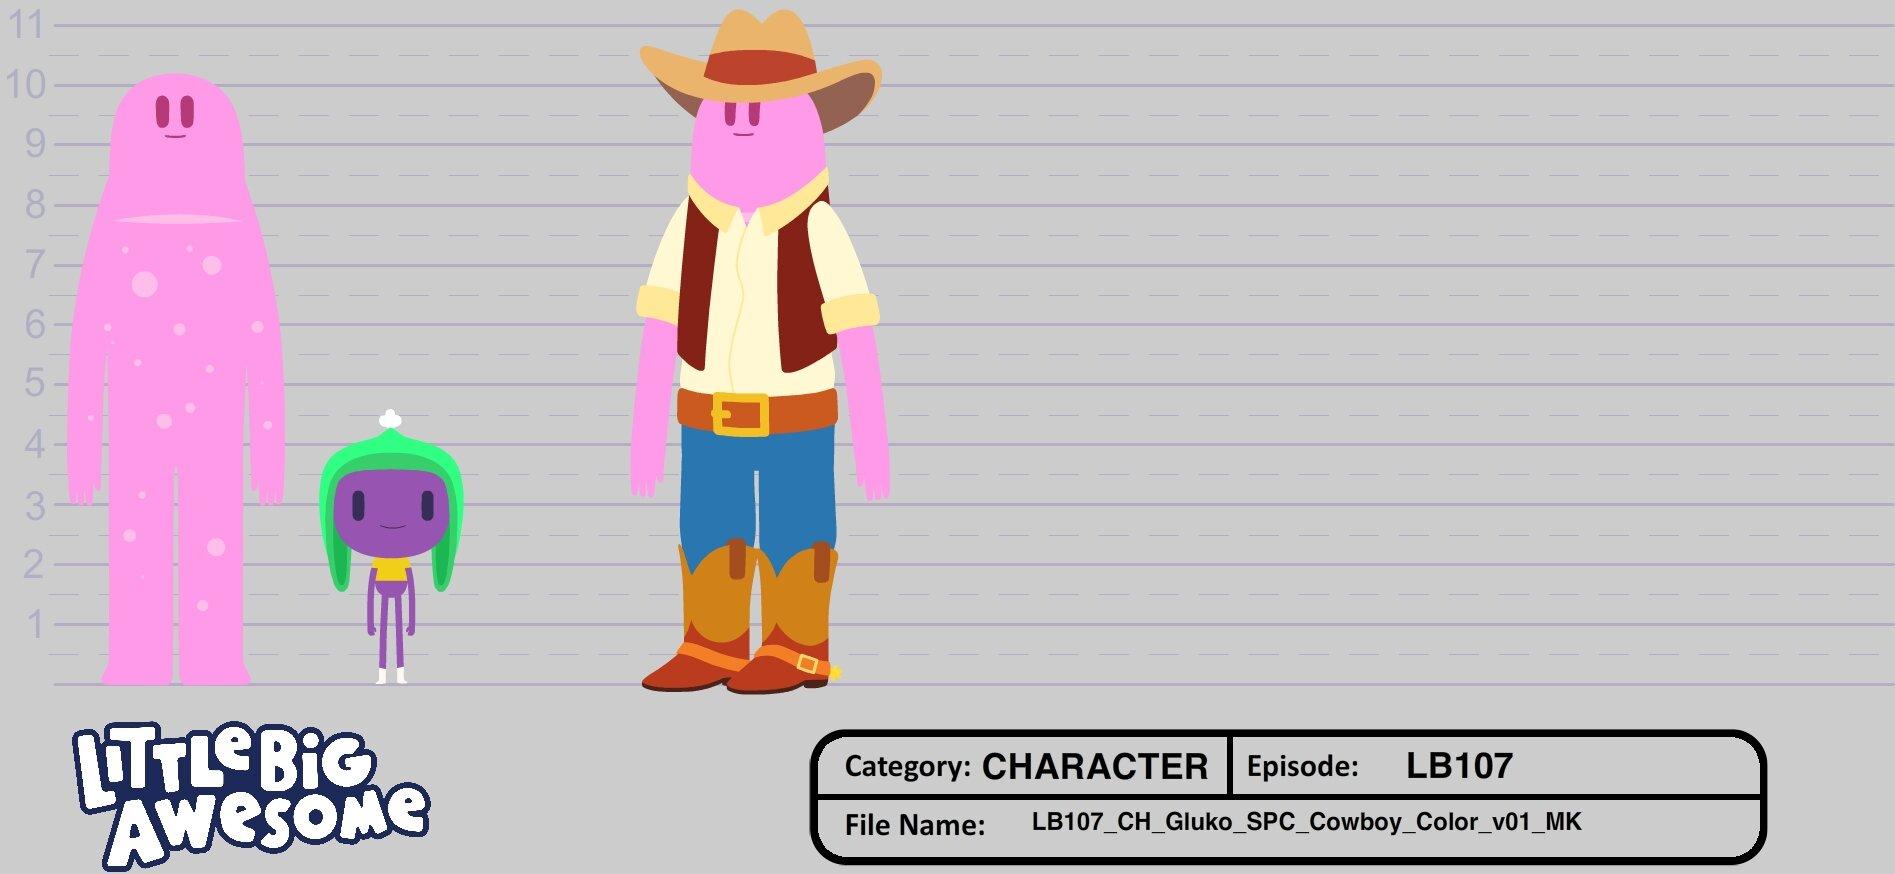 LB107_CH_A070_Gluko_SPC_Cowboy_Color_v01_MK.jpg